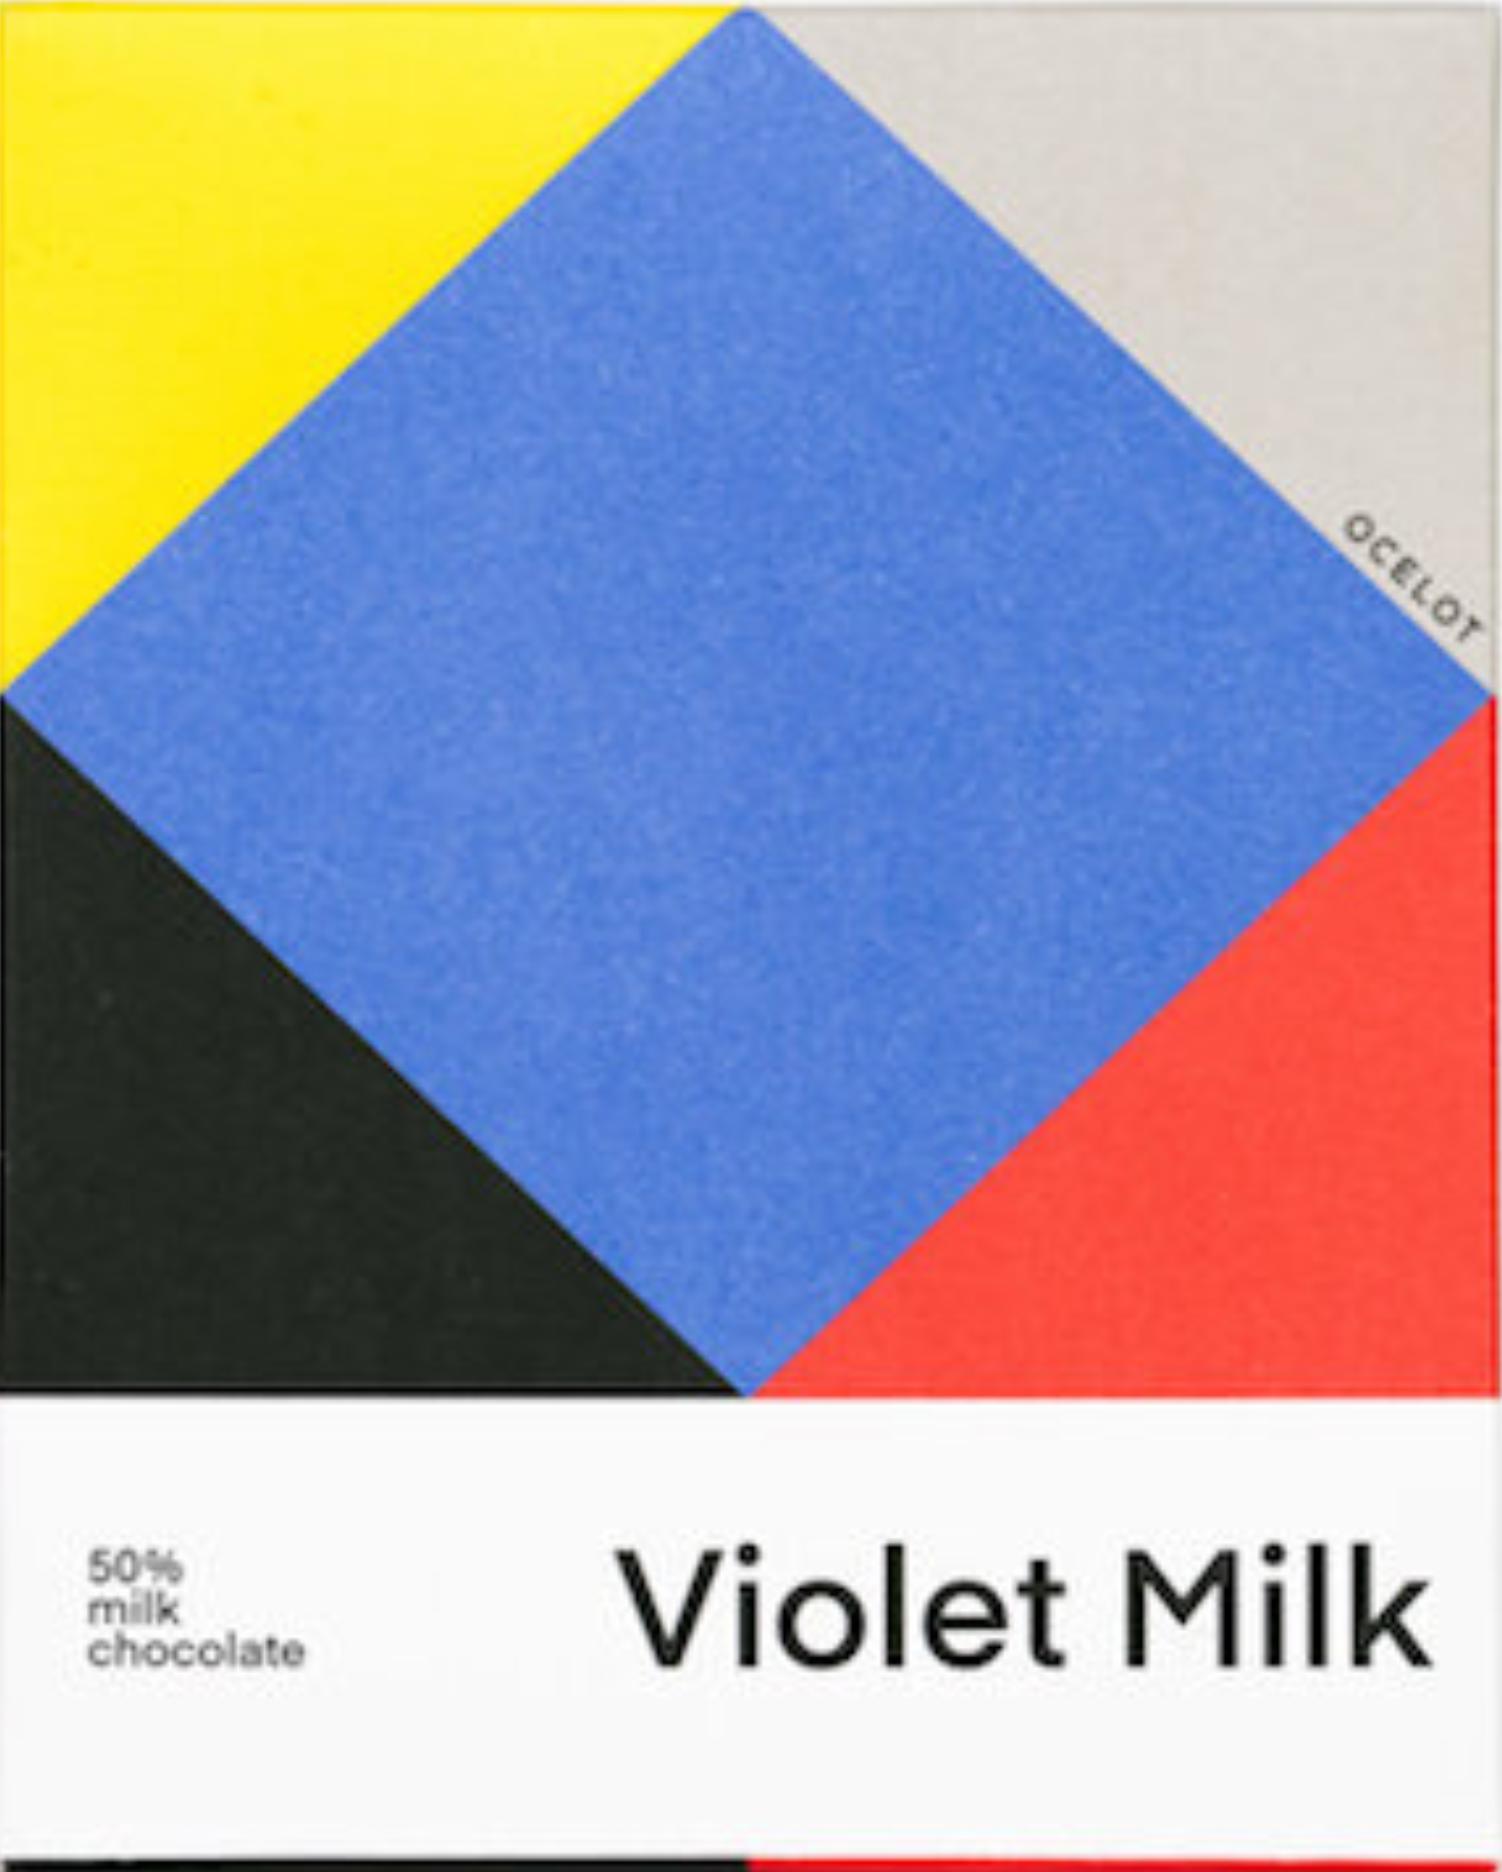 OCELOT | Milchschokolade »Violet Milk« 50% MHD 9.12.2021